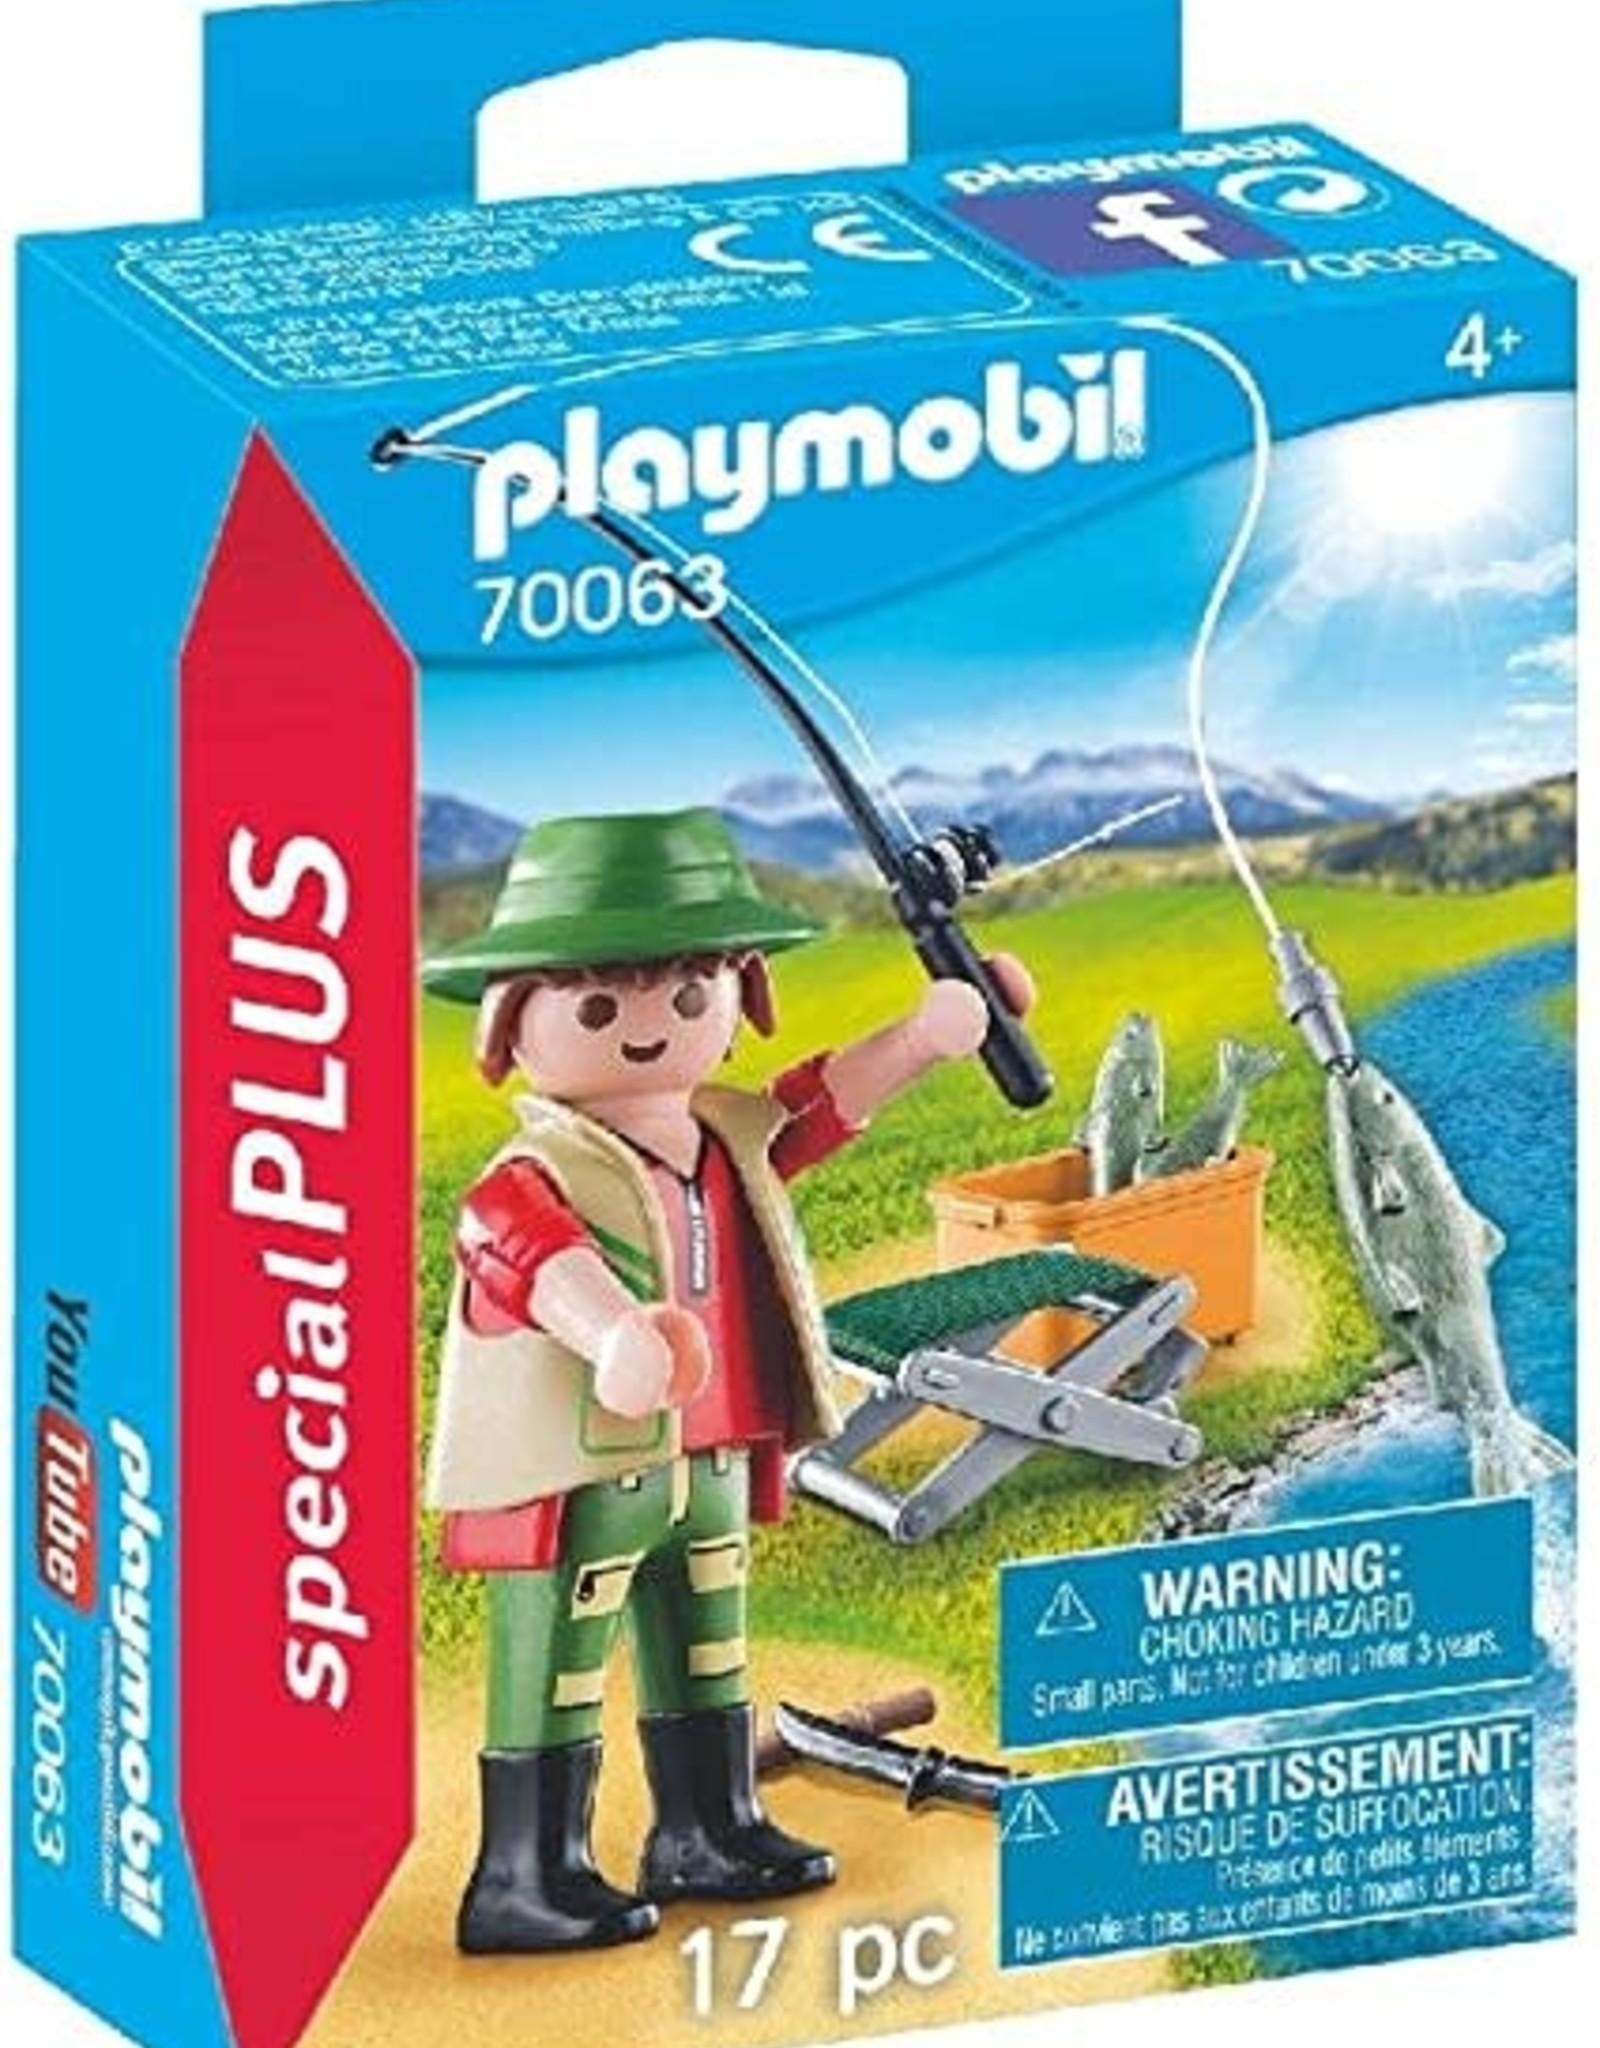 Playmobil Fisherman